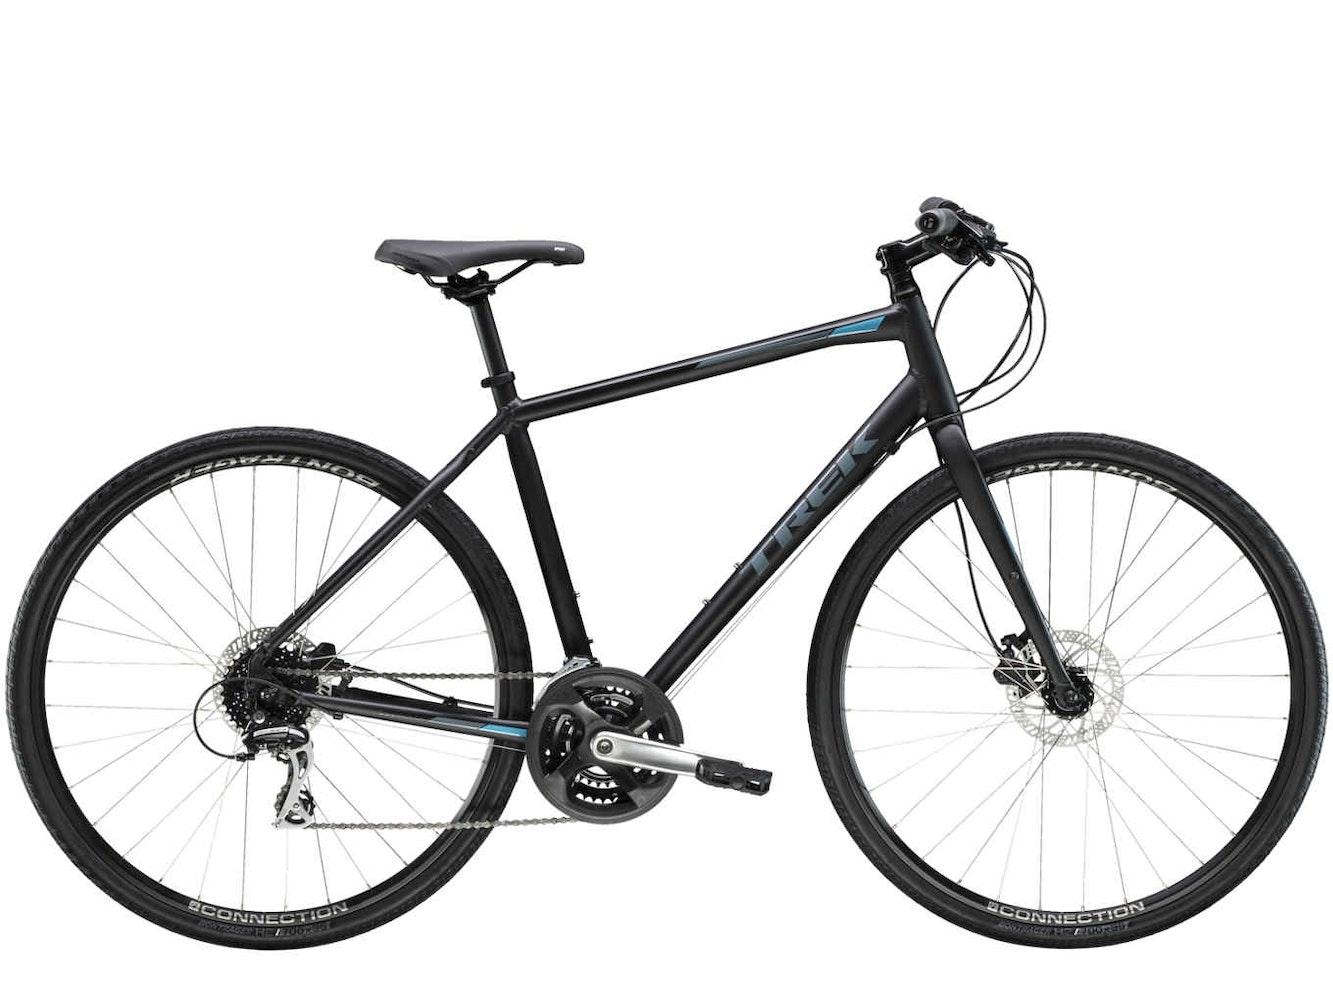 Trek Fx 2 Disc 2019 Flat Bar Road Bikes For Sale In Wynnum